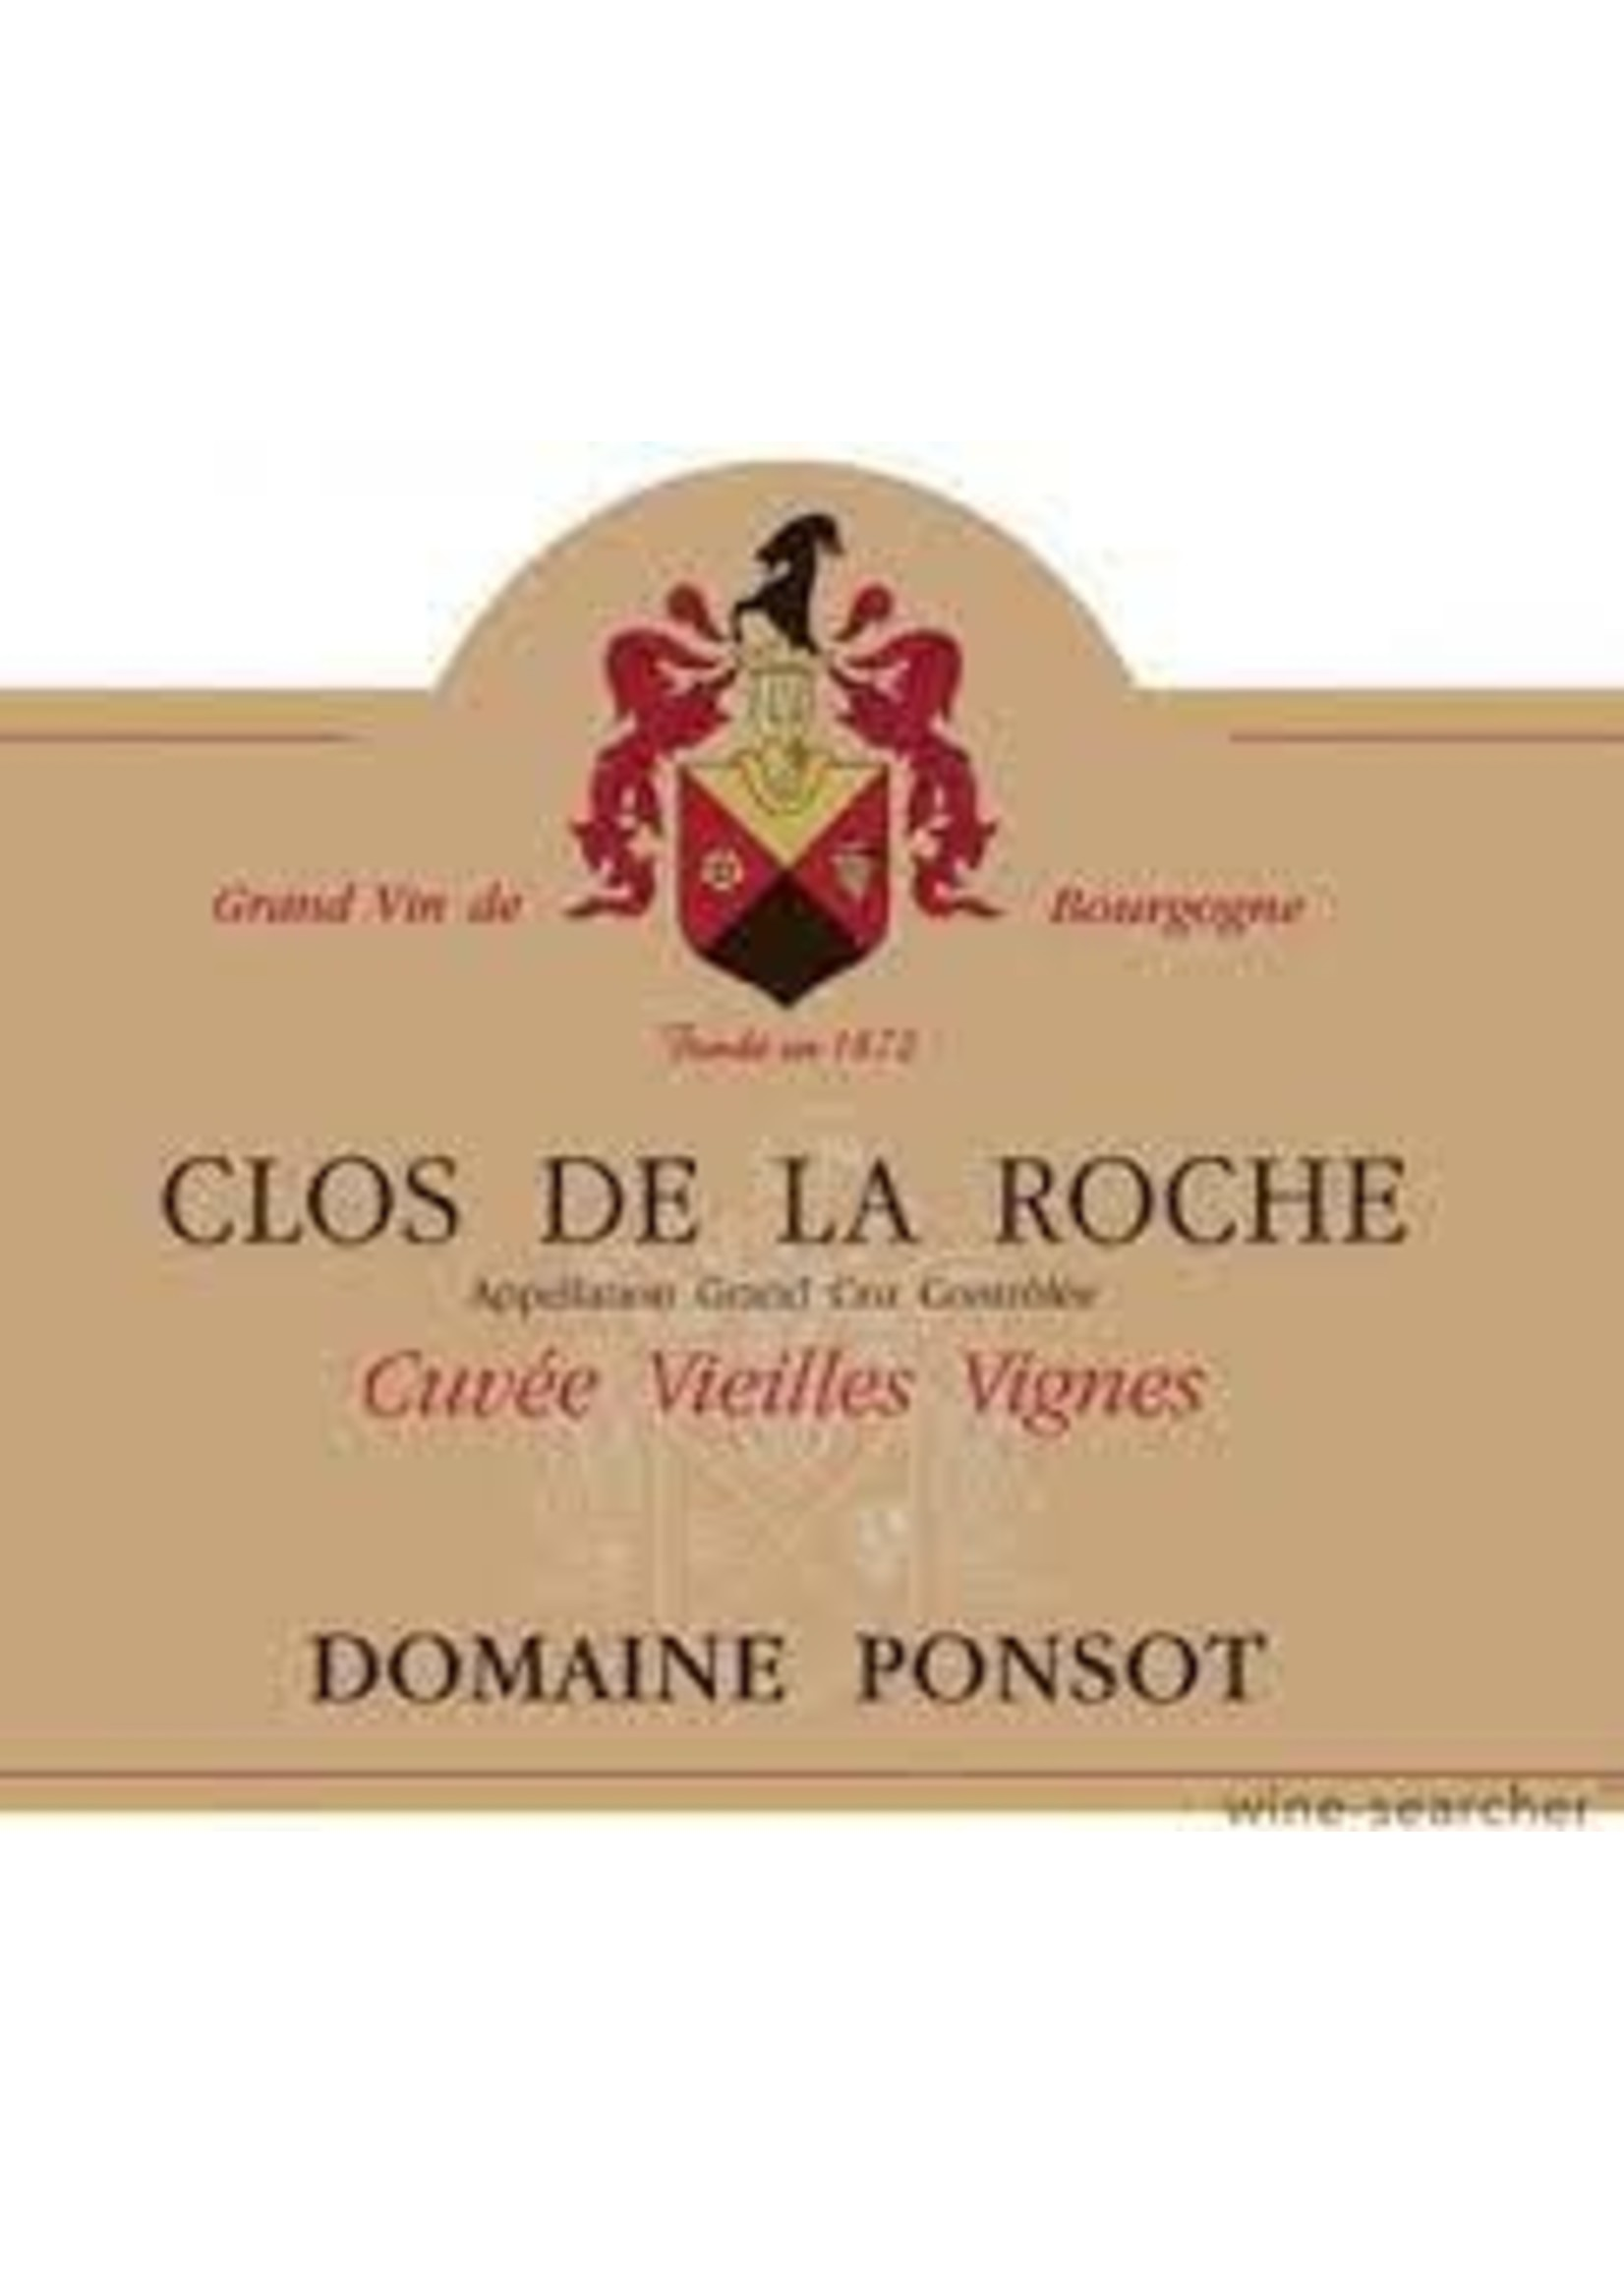 Domaine Ponsot 2009 Clos de la Roche Vieilles Vignes Grand Cru 1.5L [PRE-ARRIVAL]